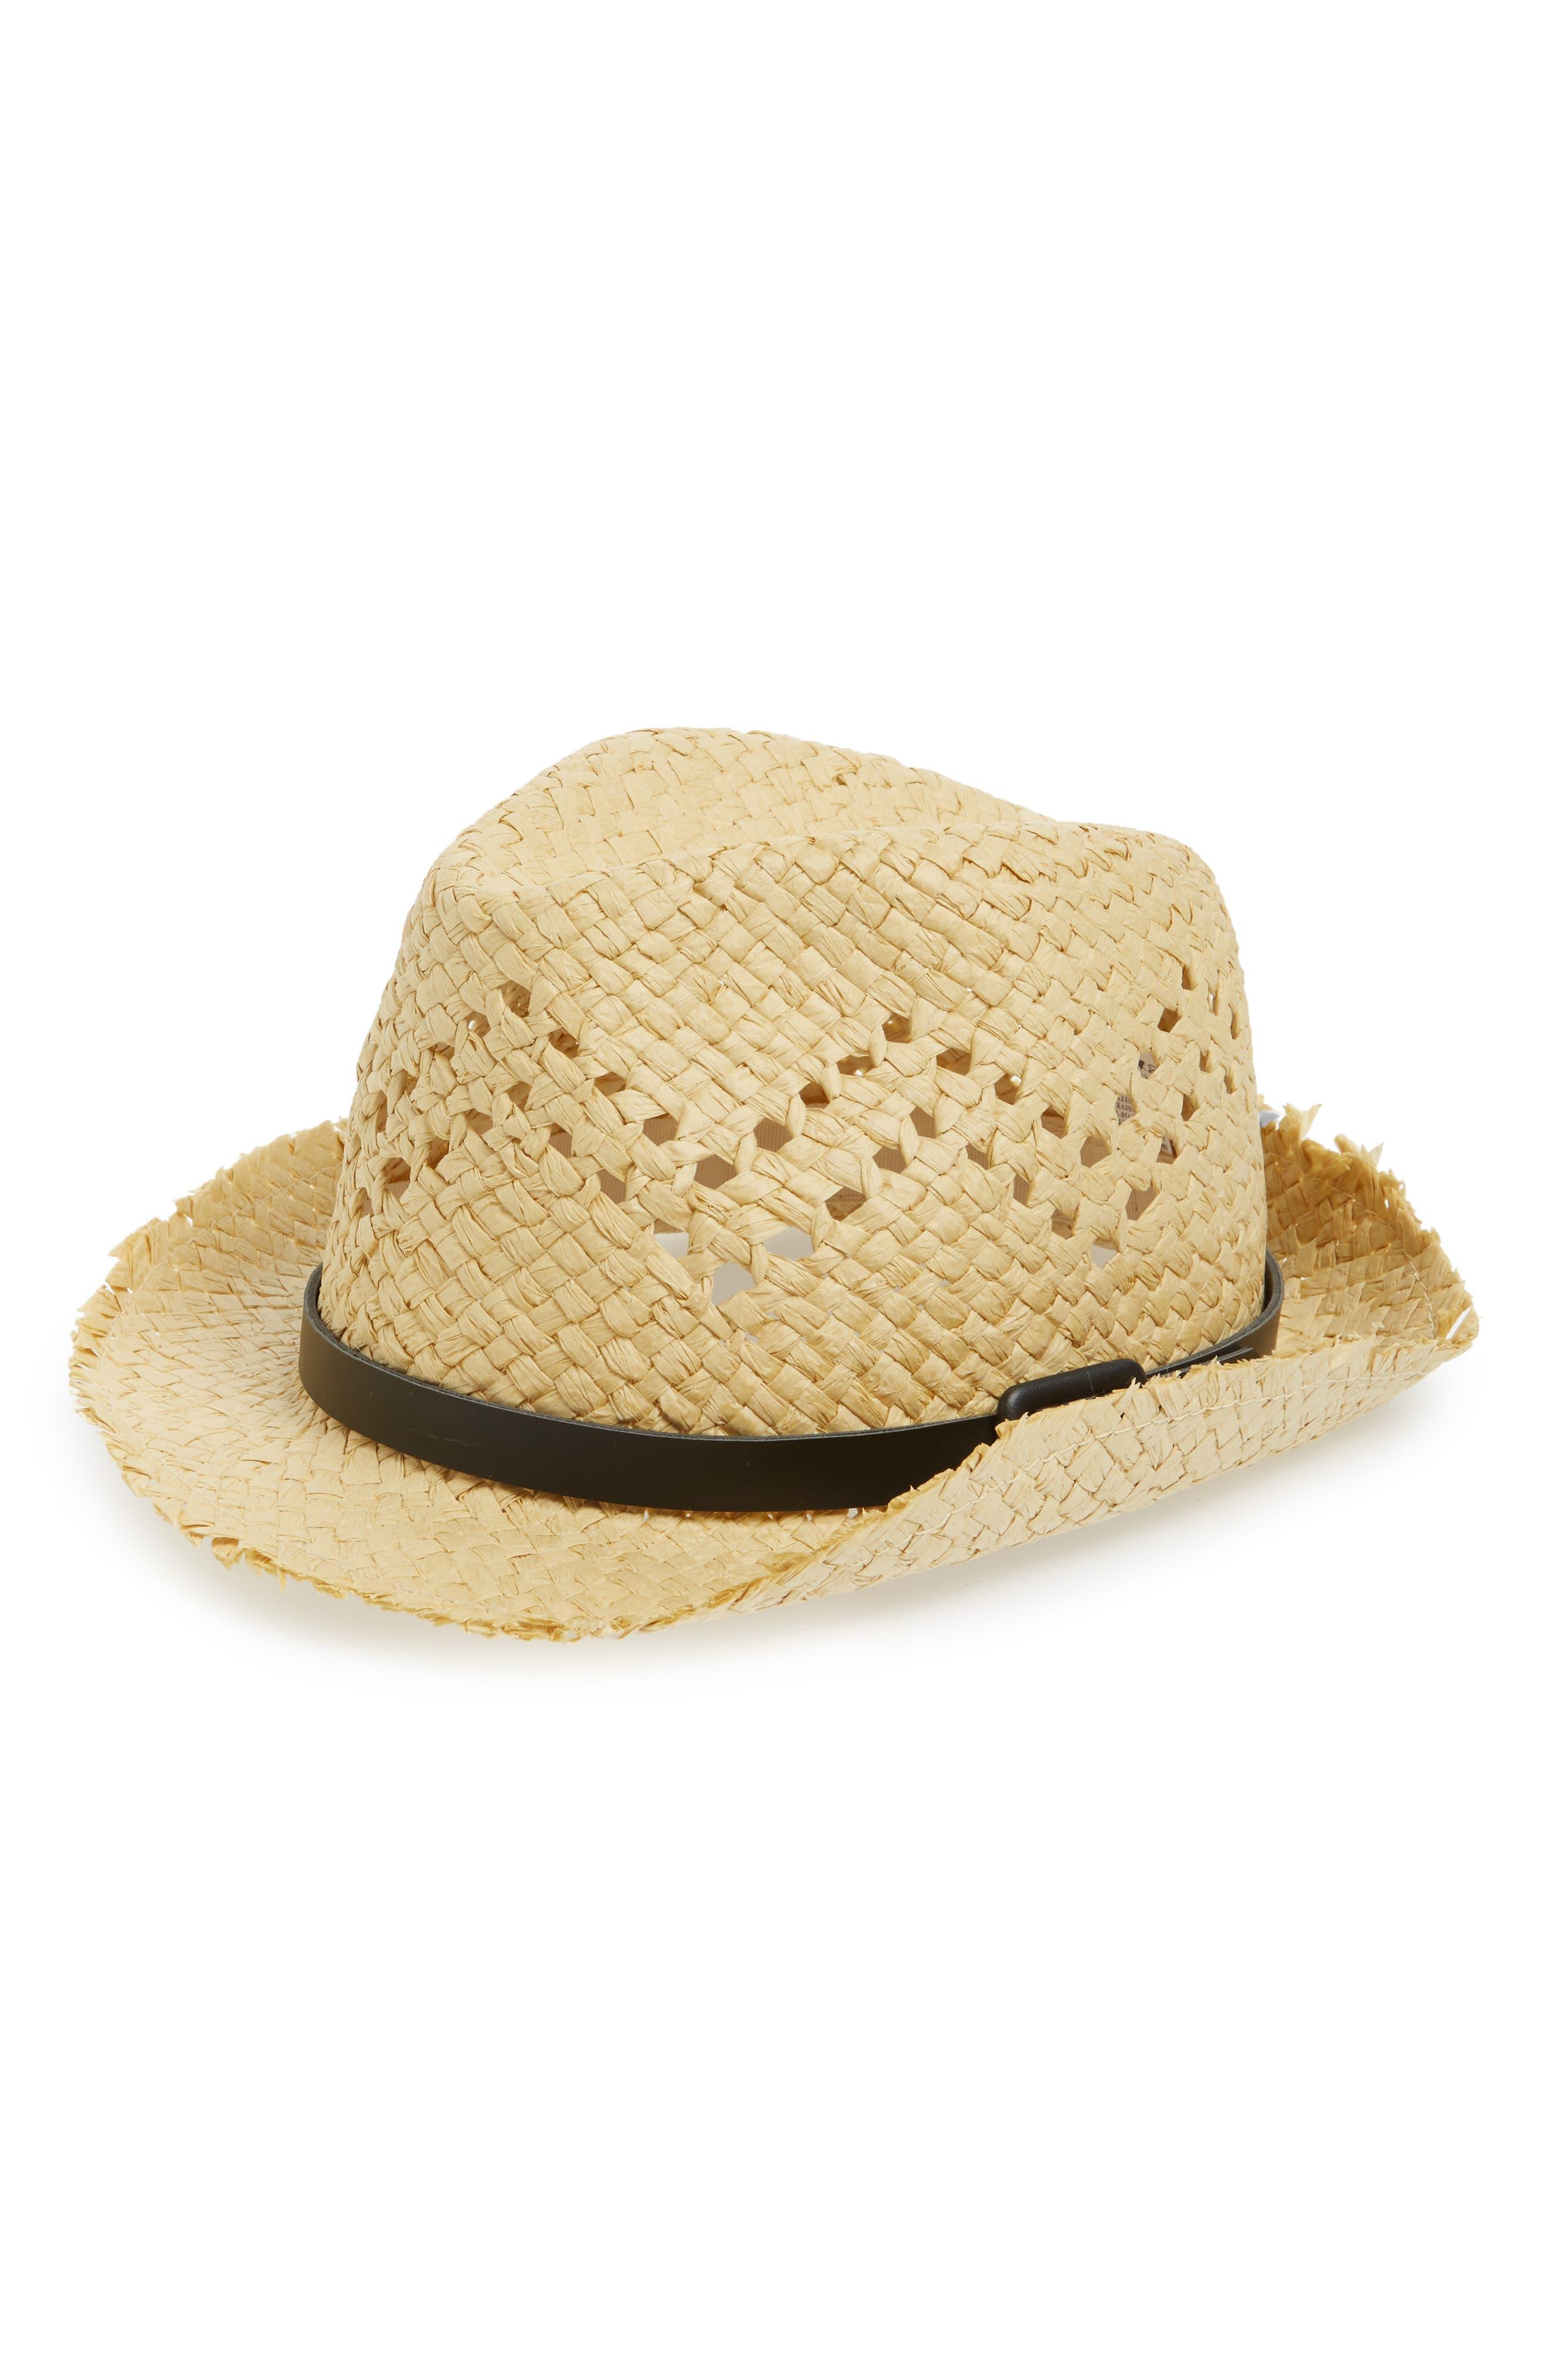 Emanuel Geraldo Buckled Band Straw Panama Hat